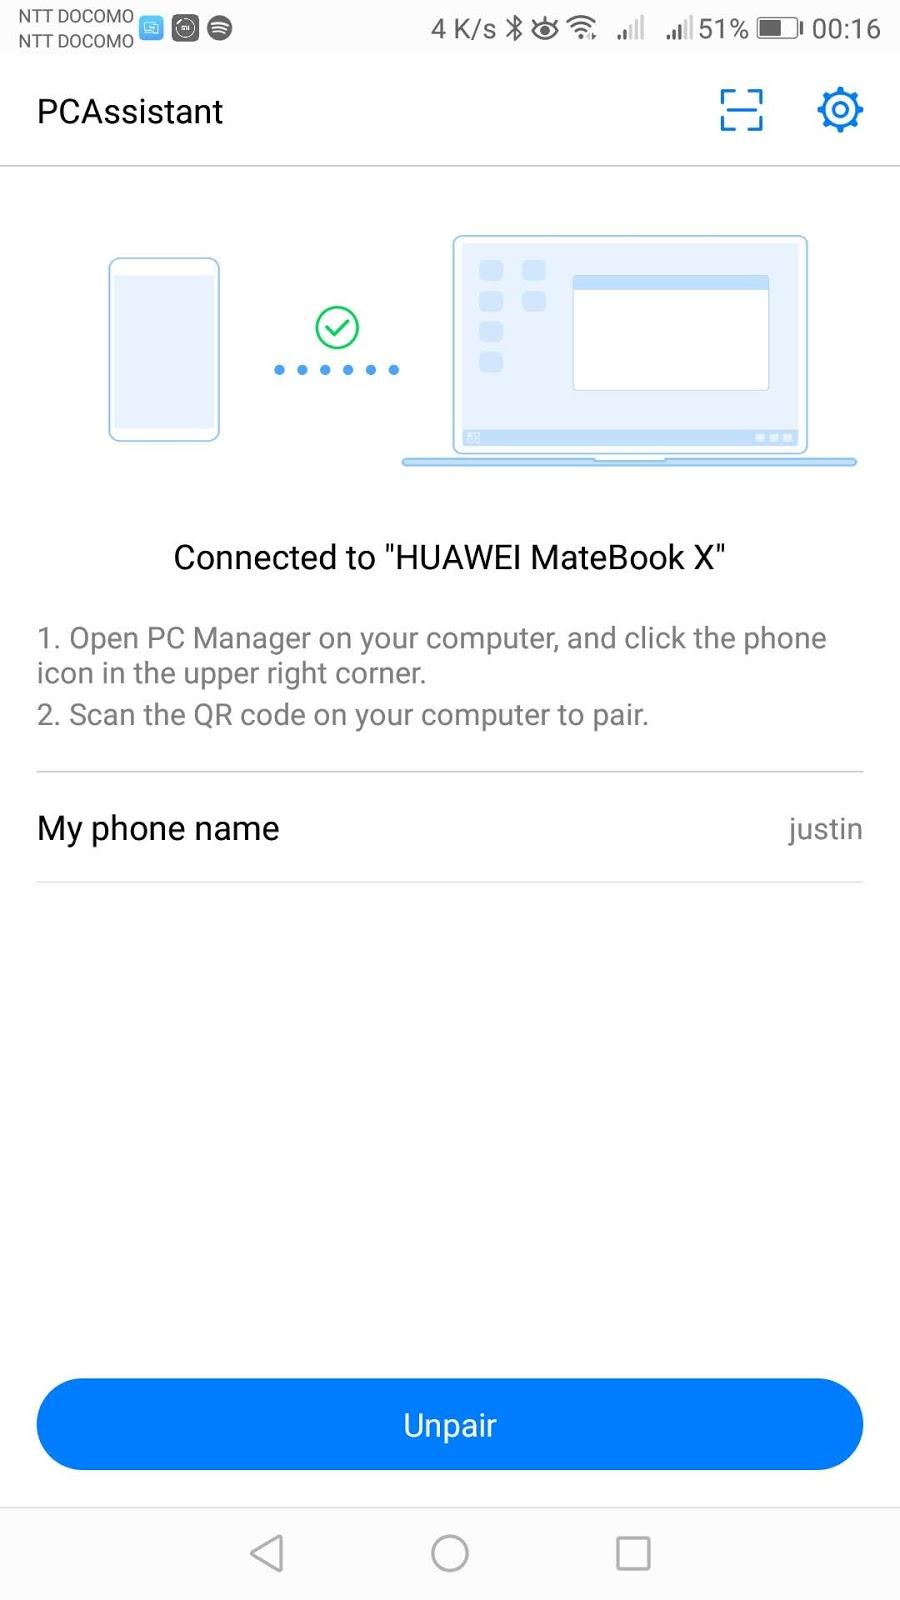 nagaBlog: Huawei MatebookとHuawei製スマートフォンをPC